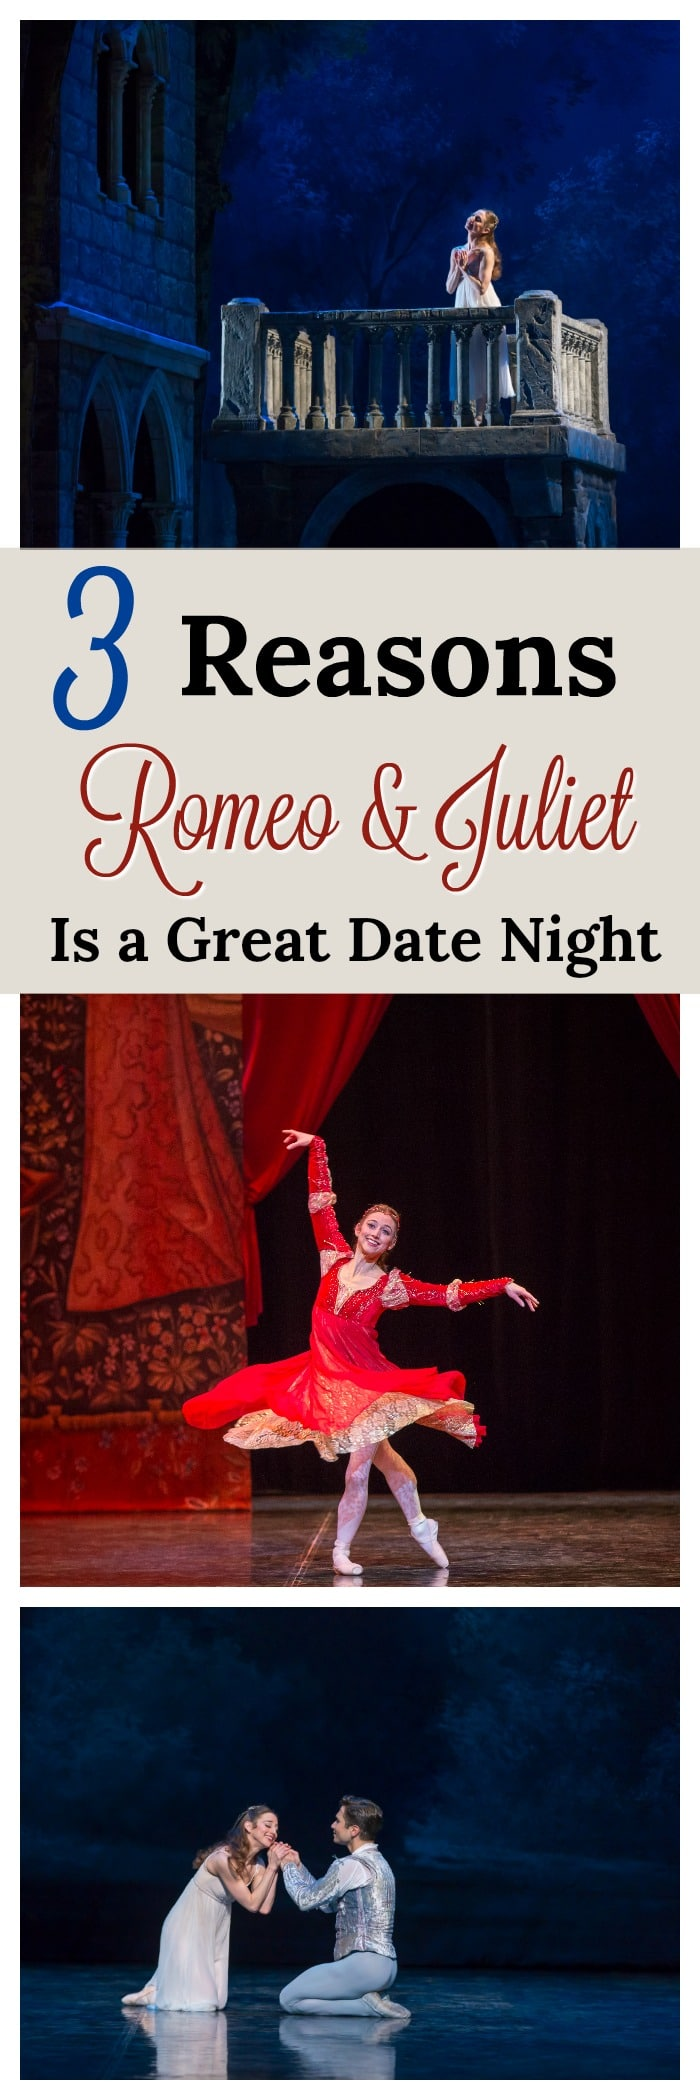 Romeo and Juliet date night ideas, date night at the colorado ballet, romeo and juliet colorado ballet